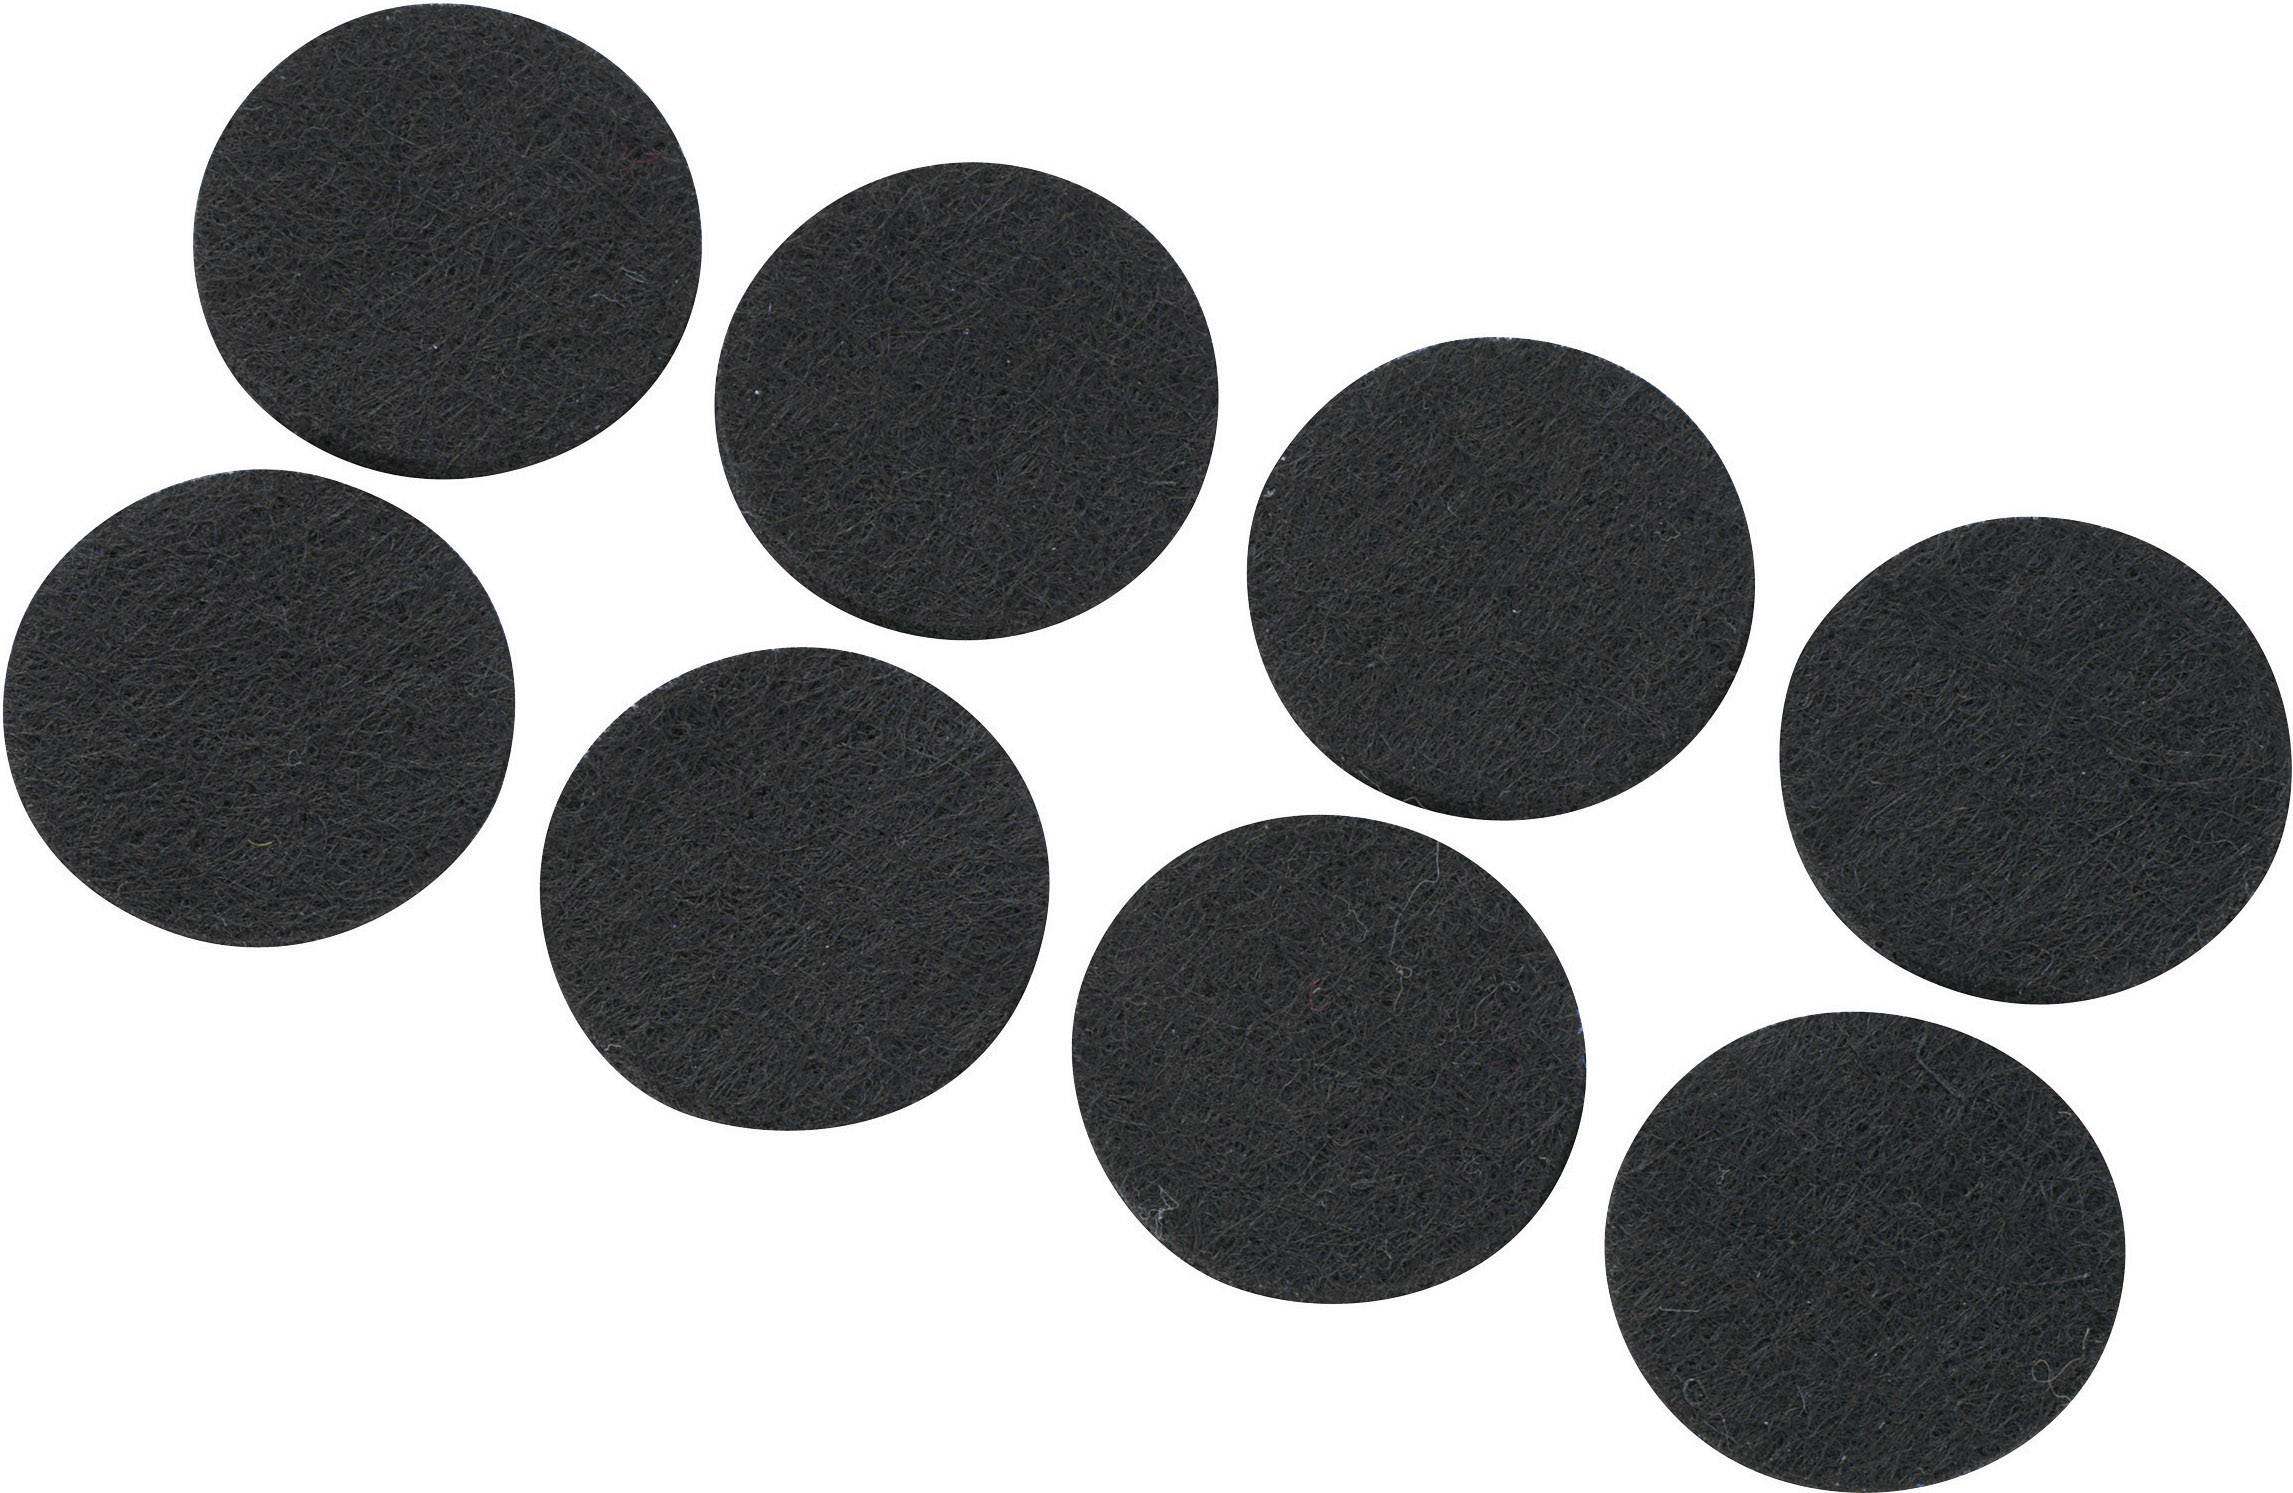 Plstené podložky (Ø x v) 25 mm x 3 mm, čierna, 8 ks